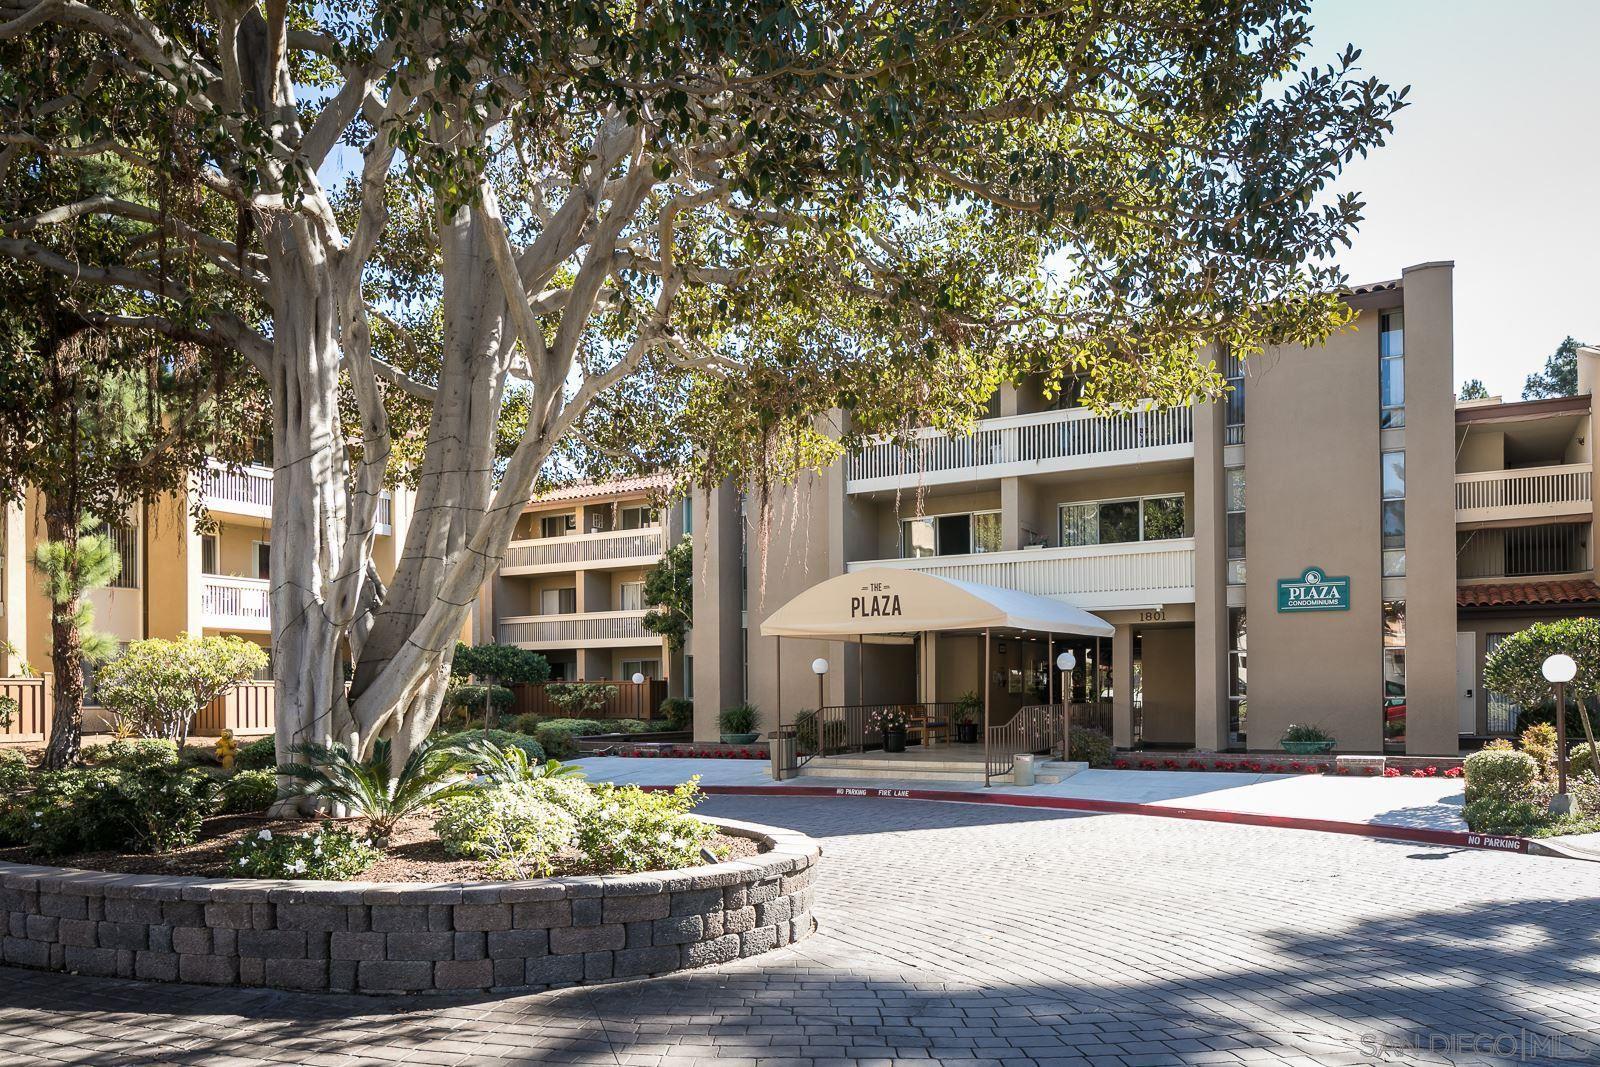 Photo for 1801 Diamond St #119, San Diego, CA 92109 (MLS # 210008808)